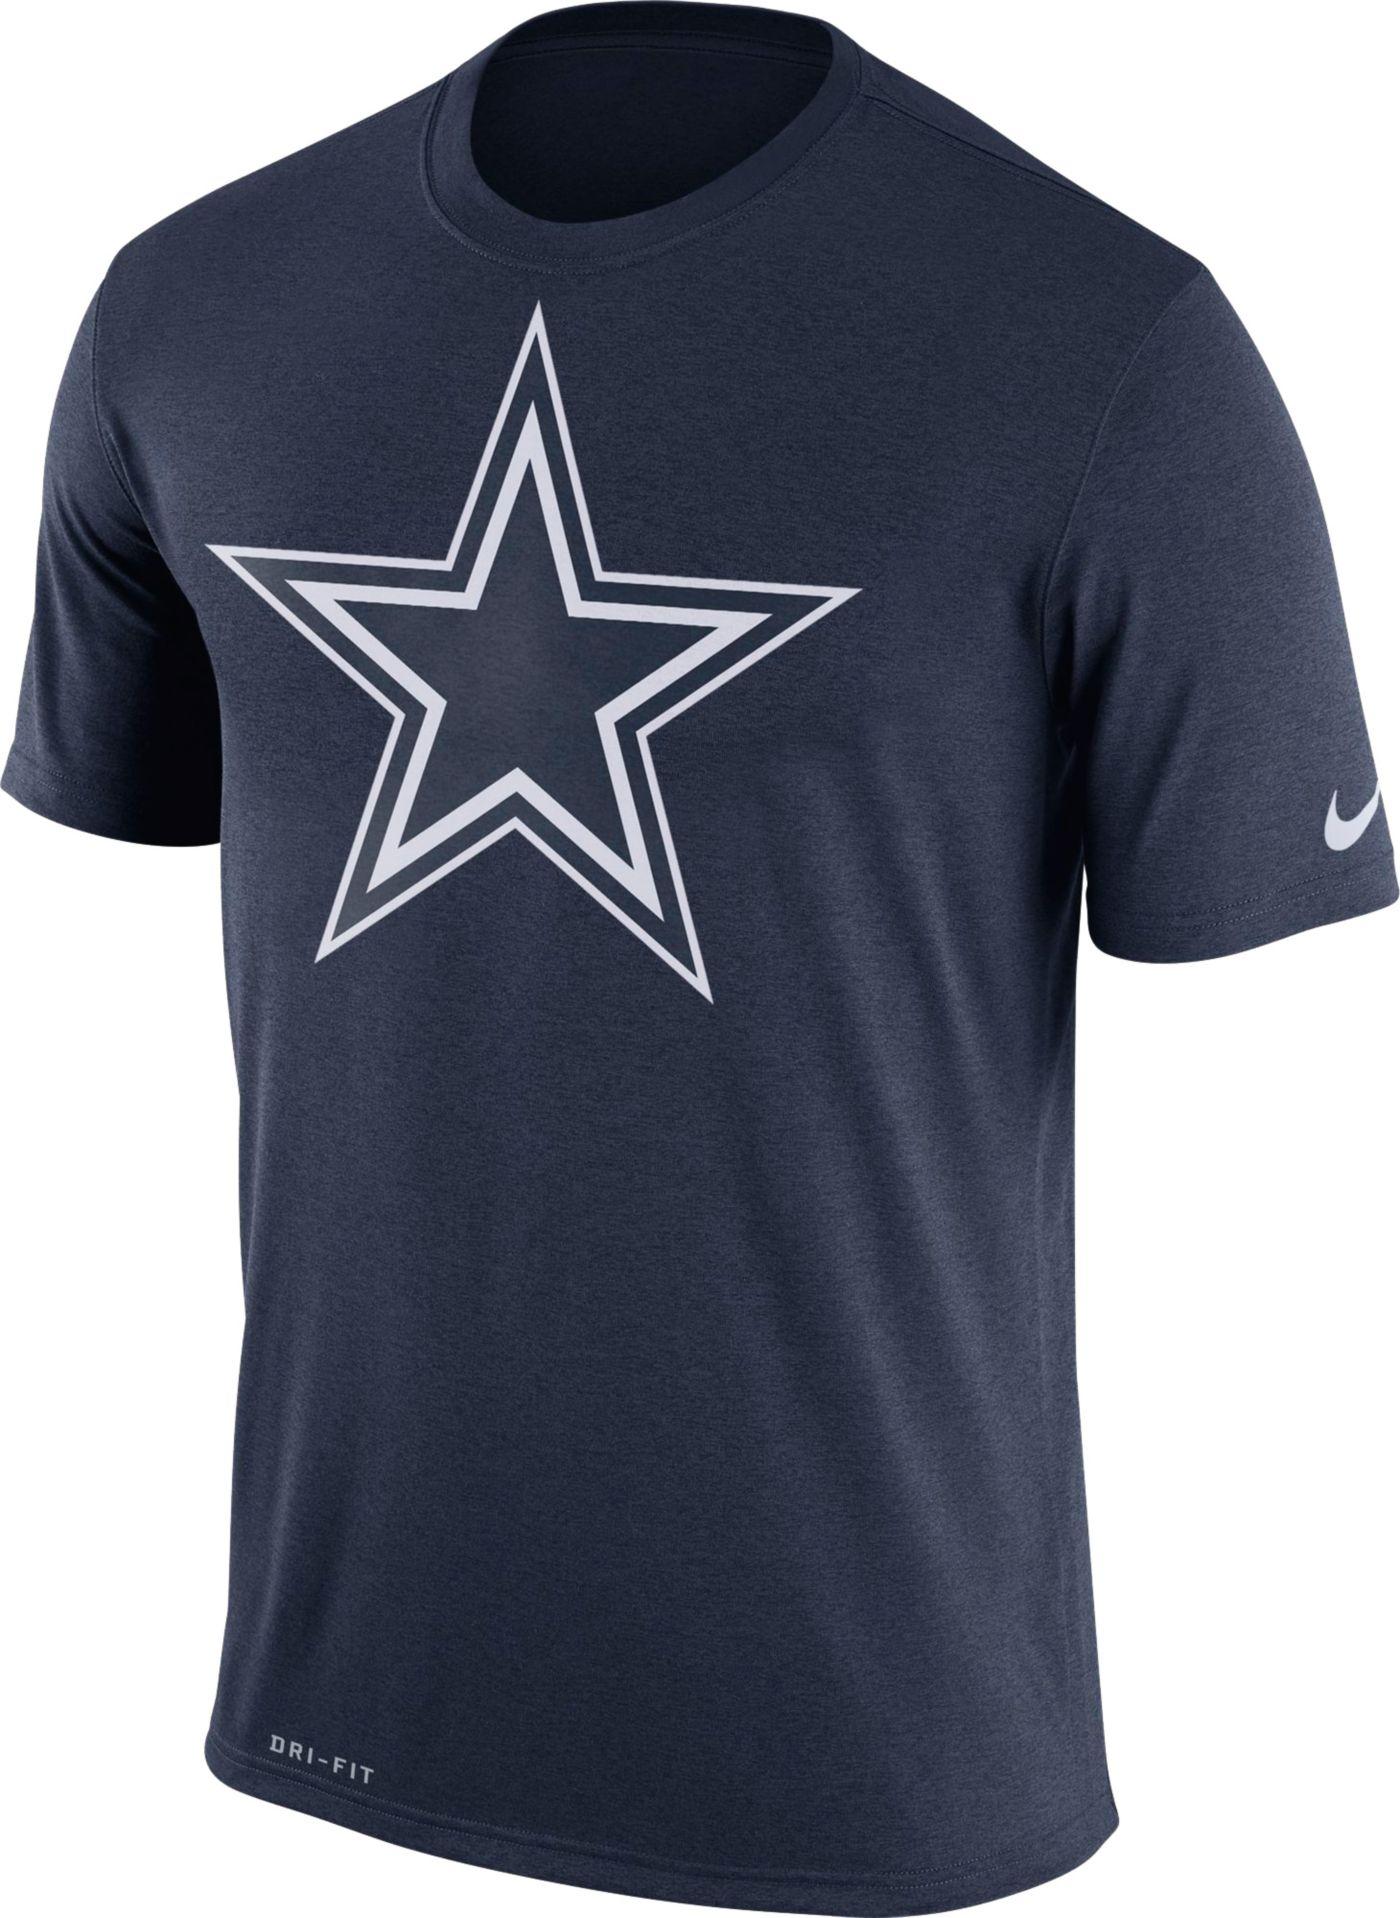 Nike Men's Dallas Cowboys Legend Logo Performance Navy T-Shirt